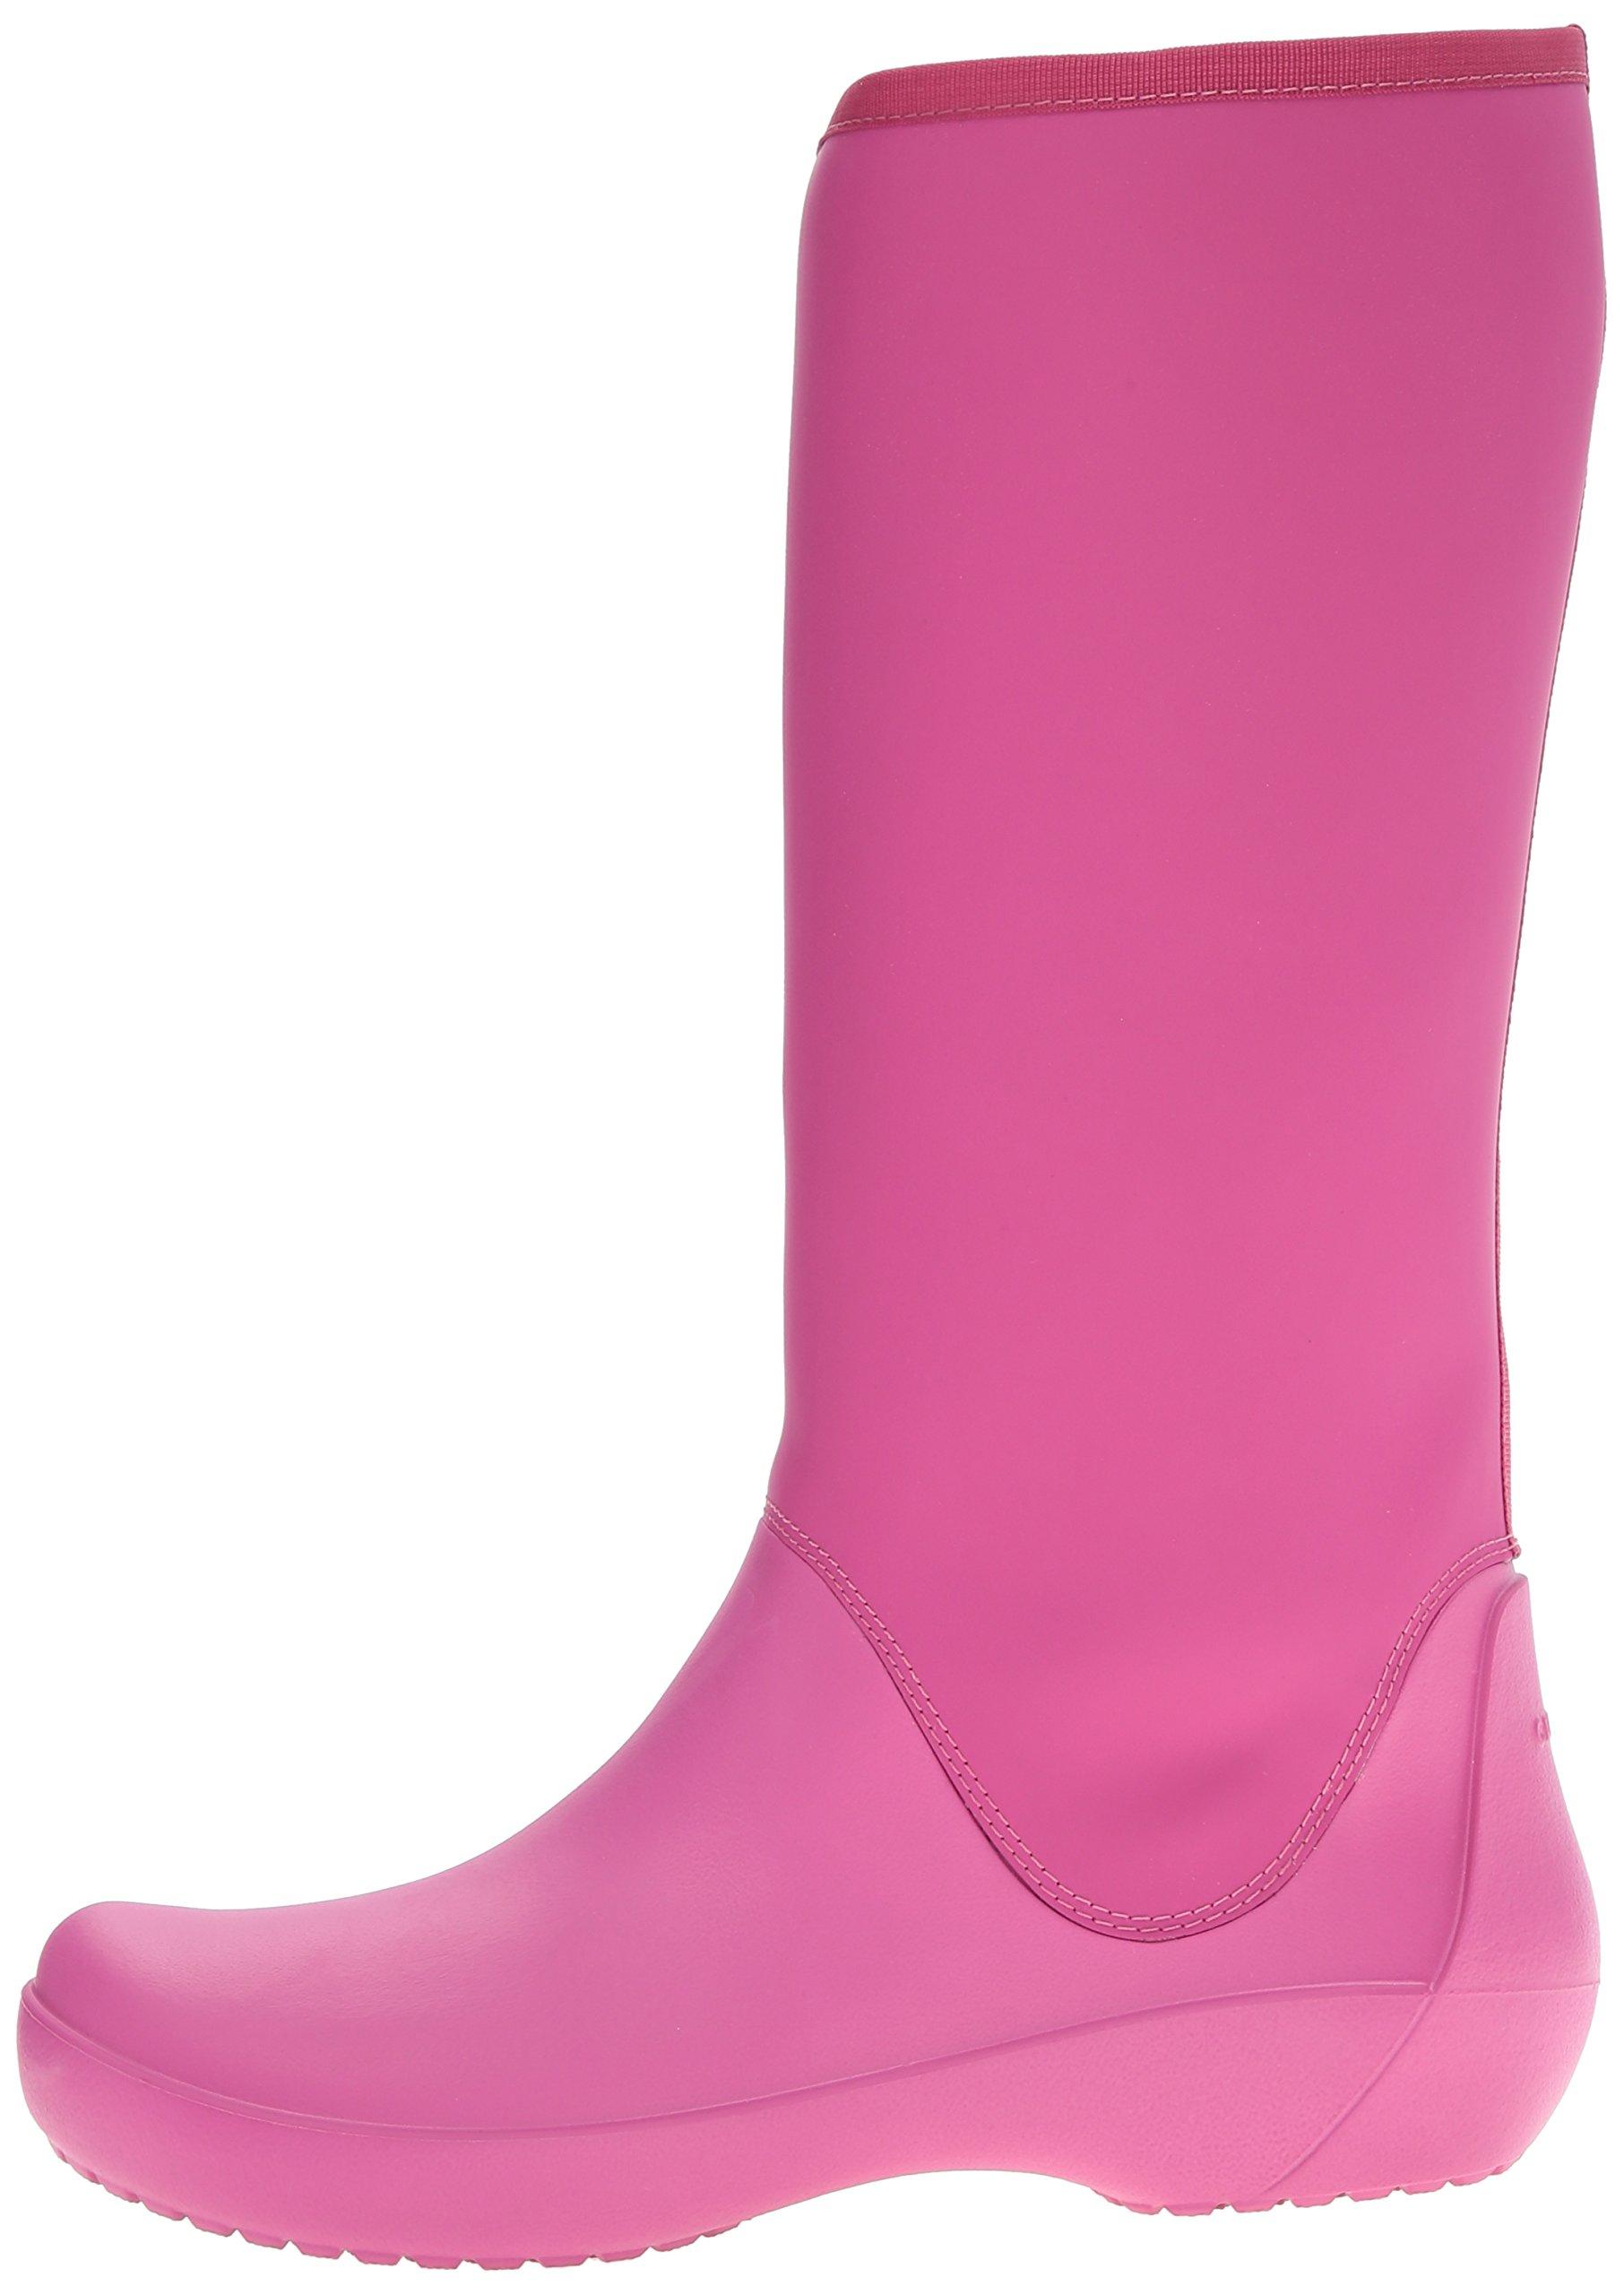 Crocs Women's Rain Floe Tall Boot, Berry, 7 M US by Crocs (Image #5)